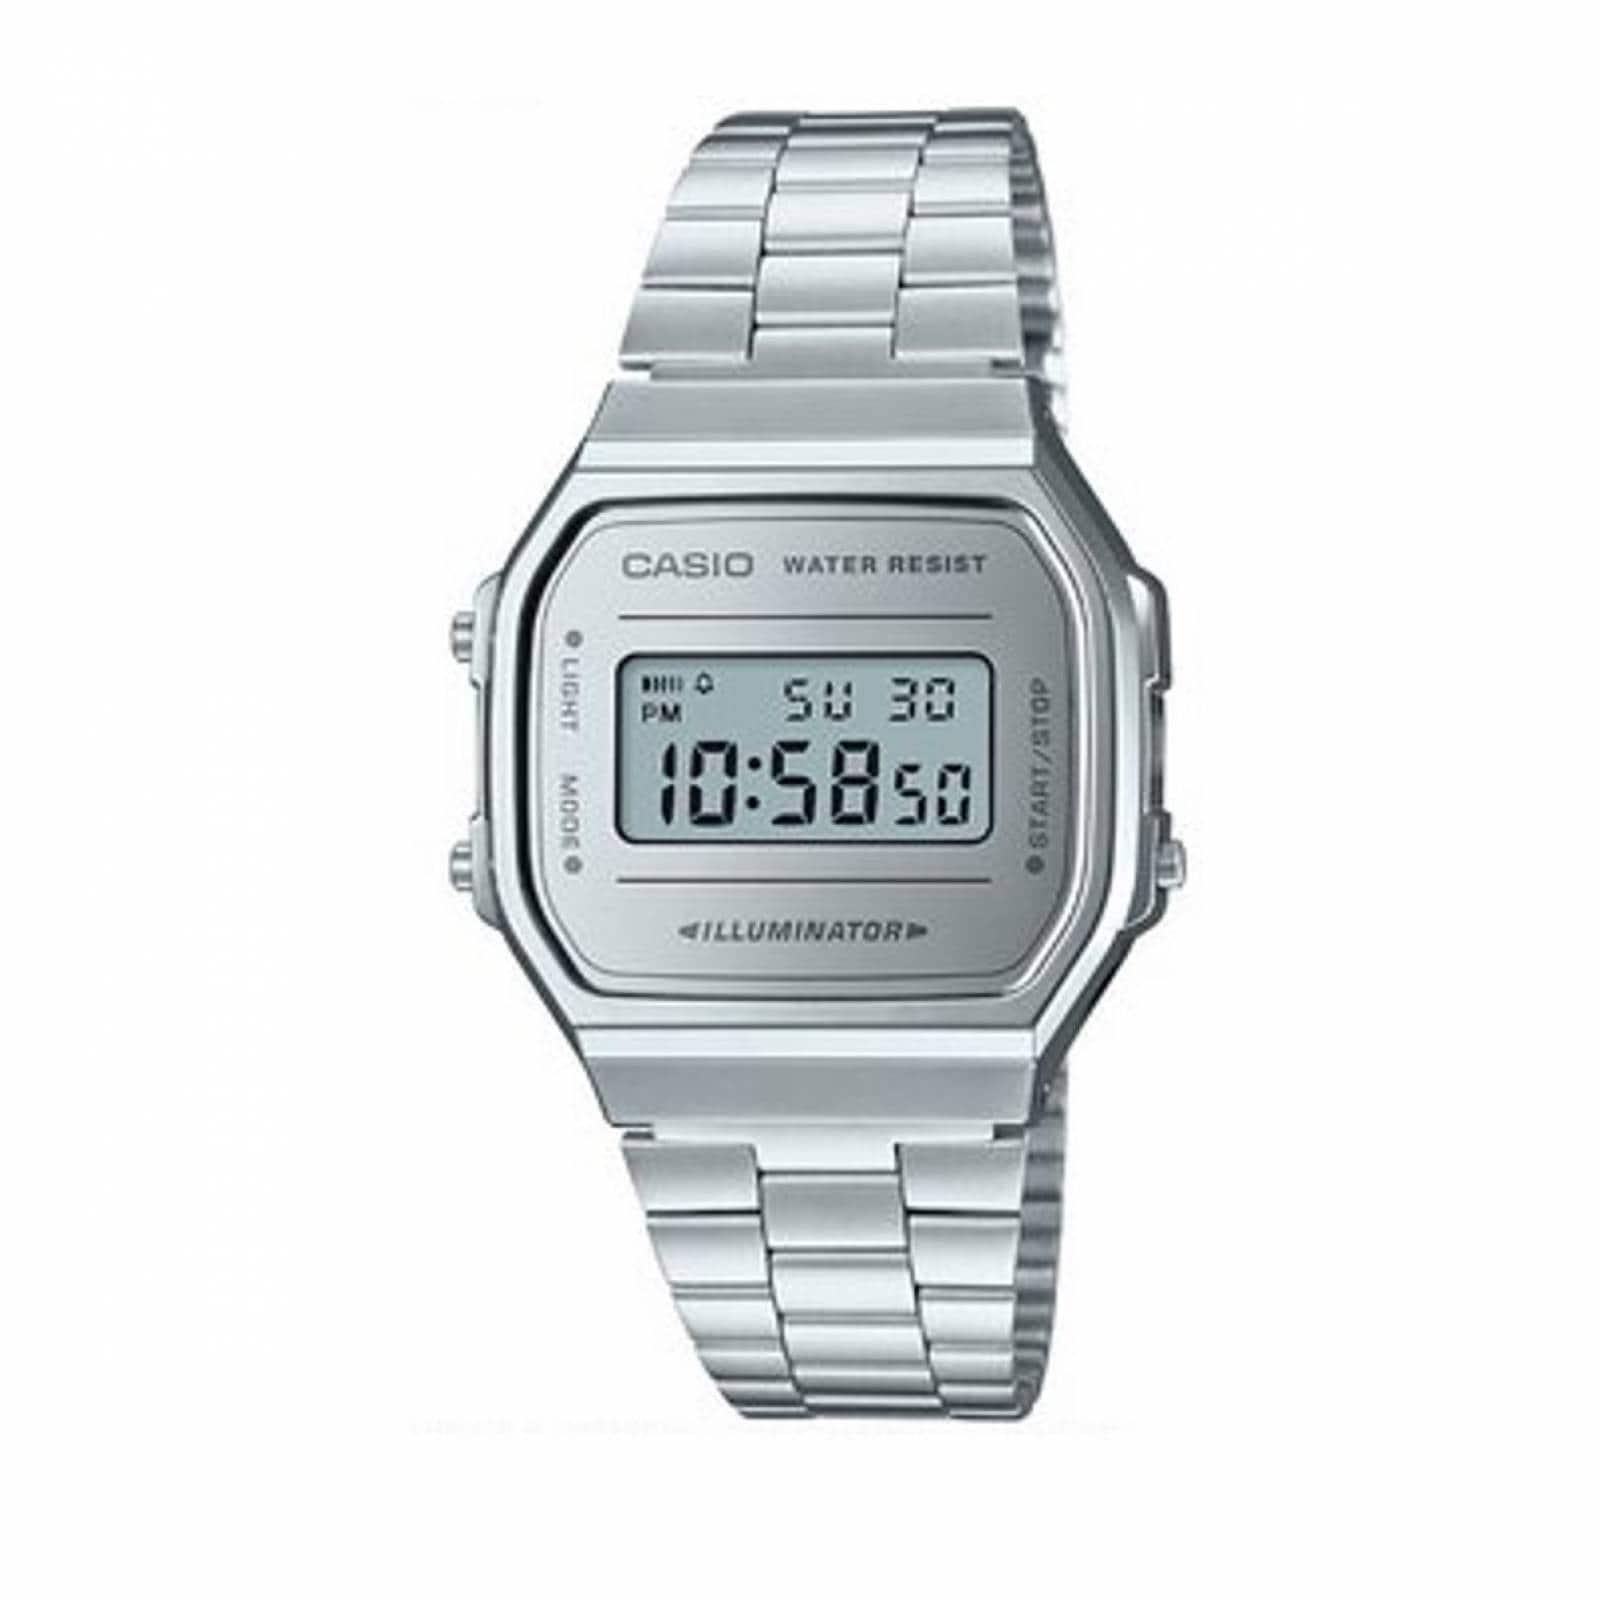 76f554bed6d7 Reloj casio retro vintage a168 plata espejo plata- 100% original cfmx